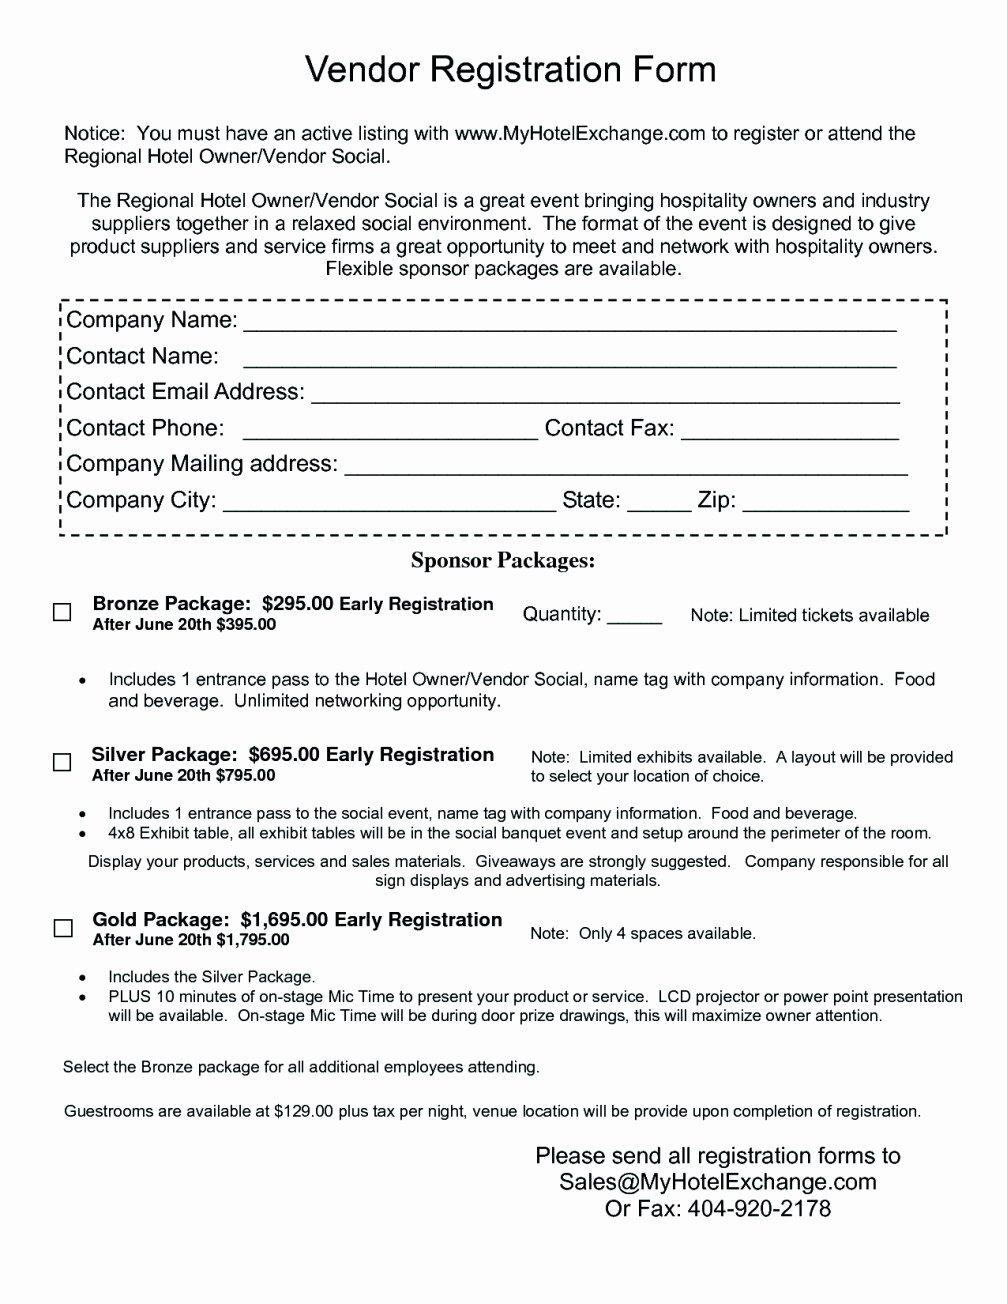 Vendor Registration form Template Fresh Free Vendor Registration form Template Template